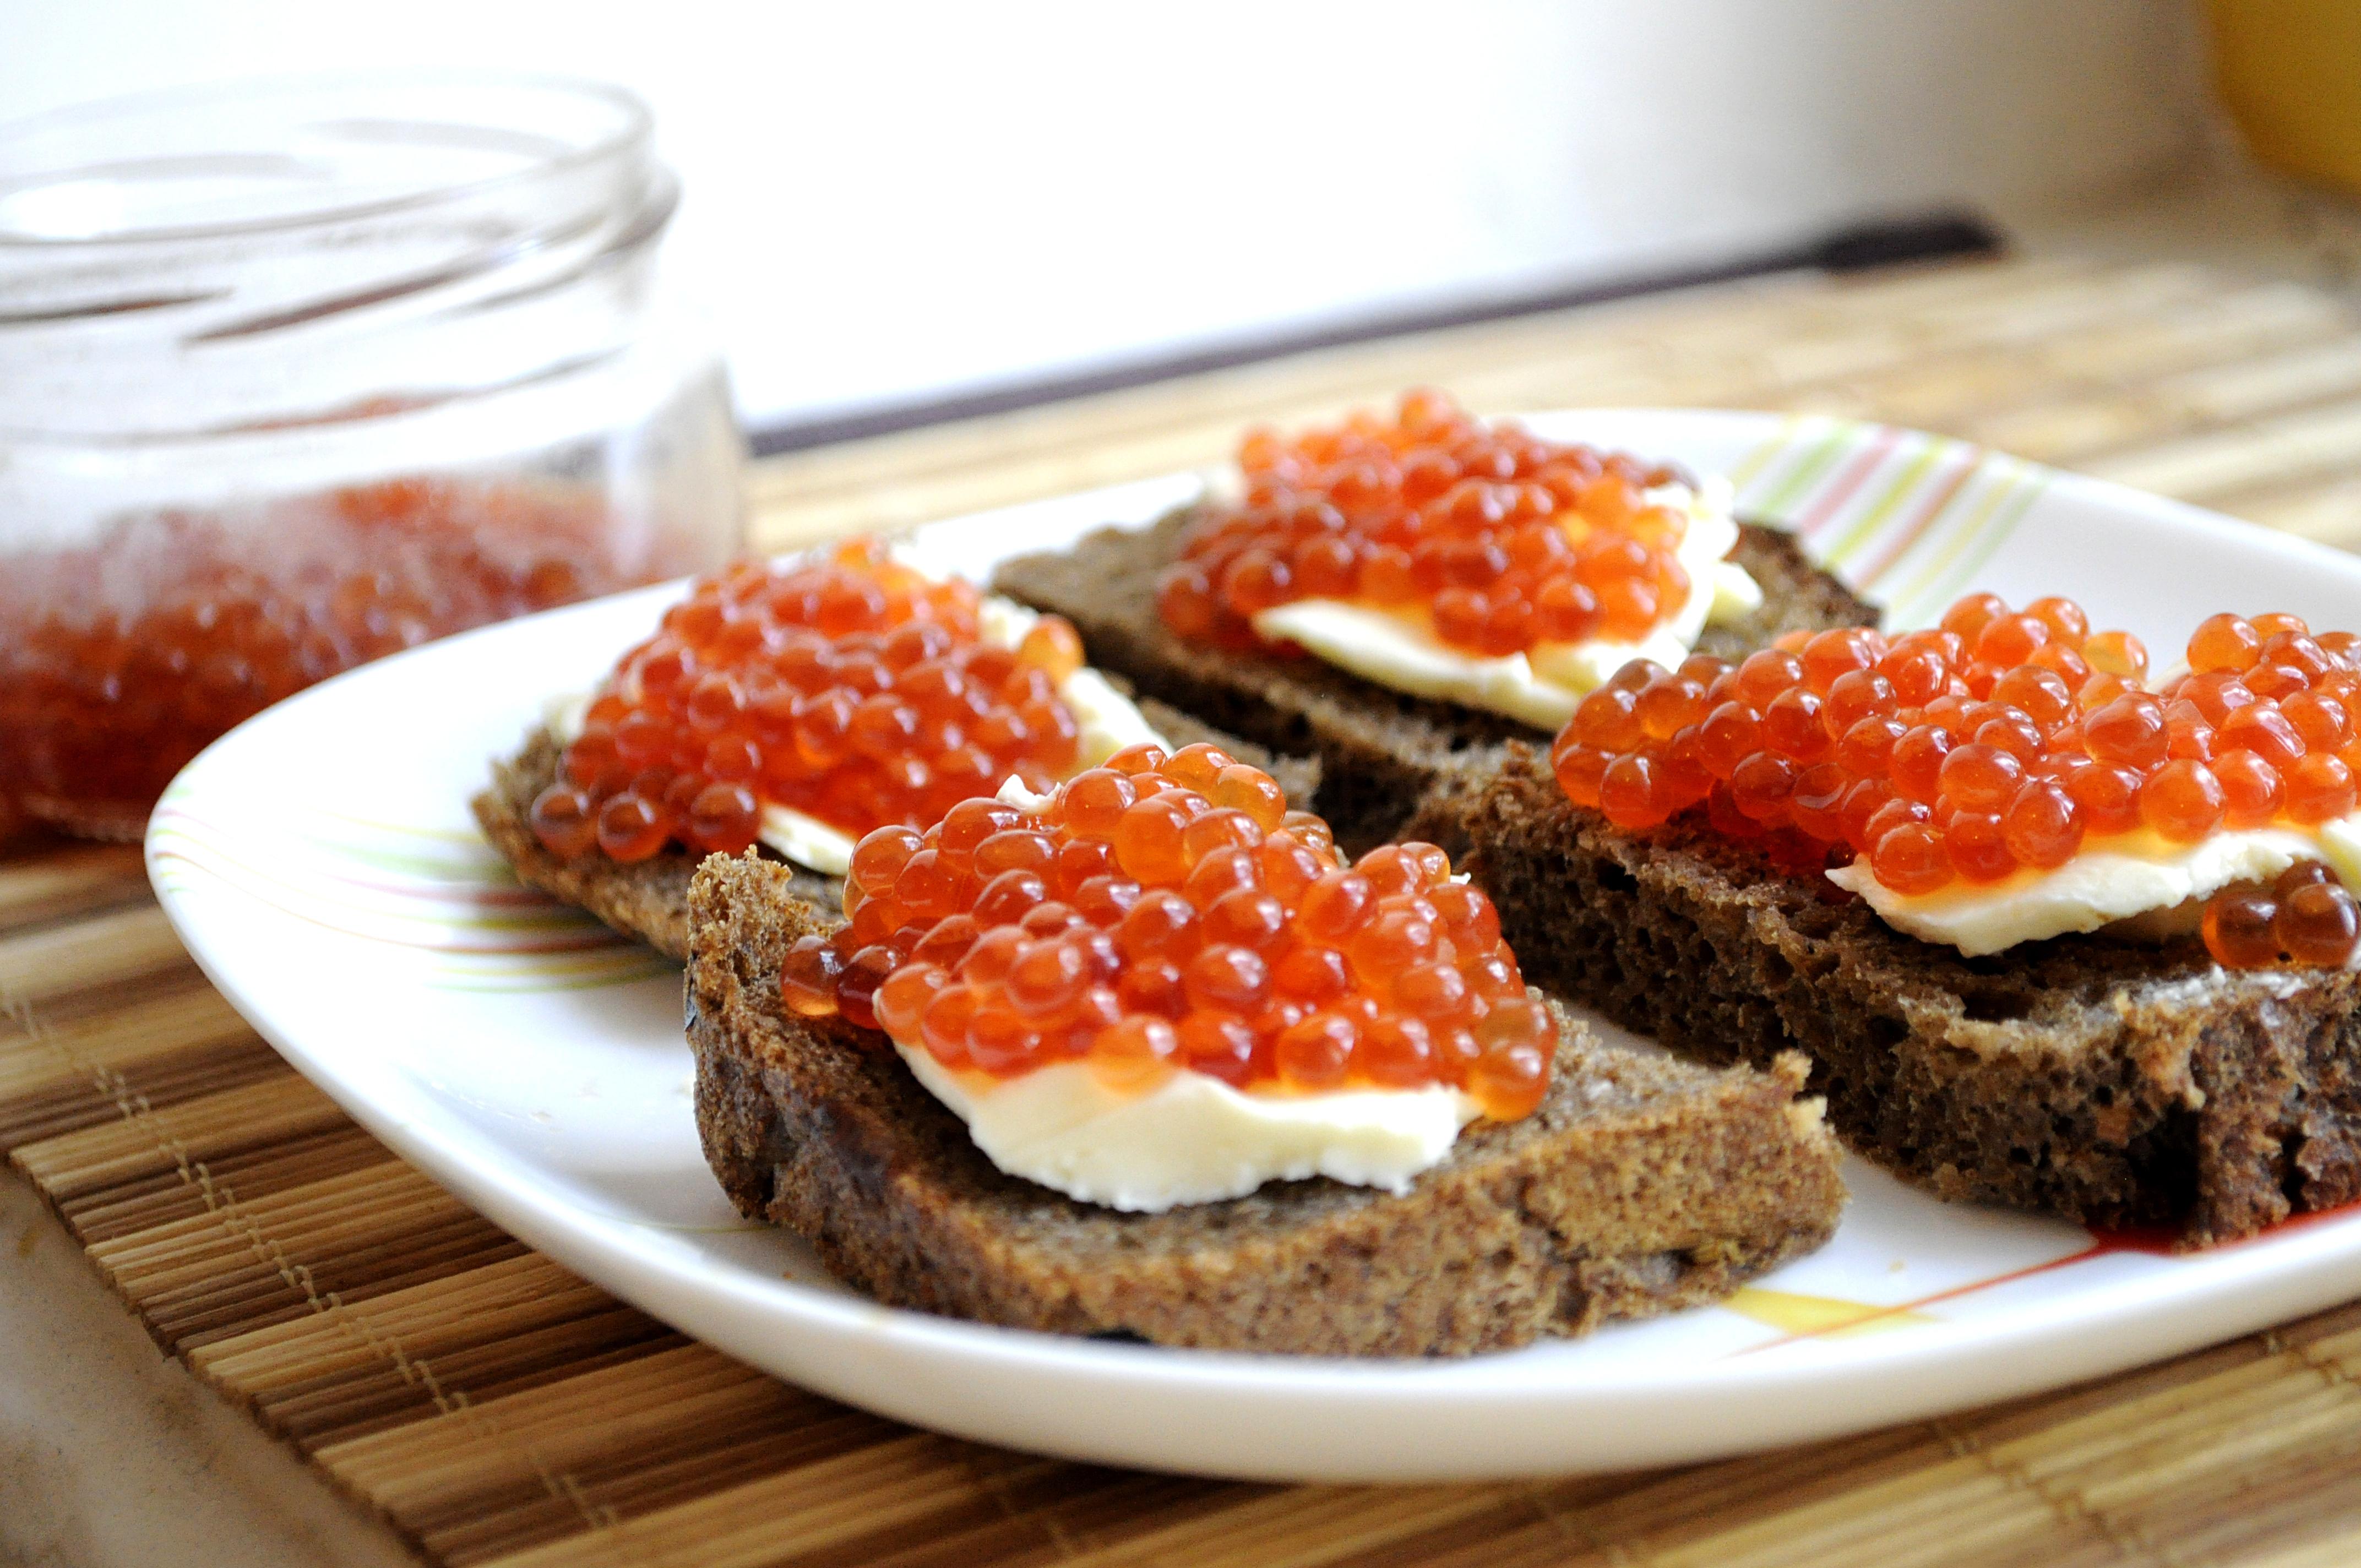 Изображение - На дальний восток russian-red-caviar-home-recipe